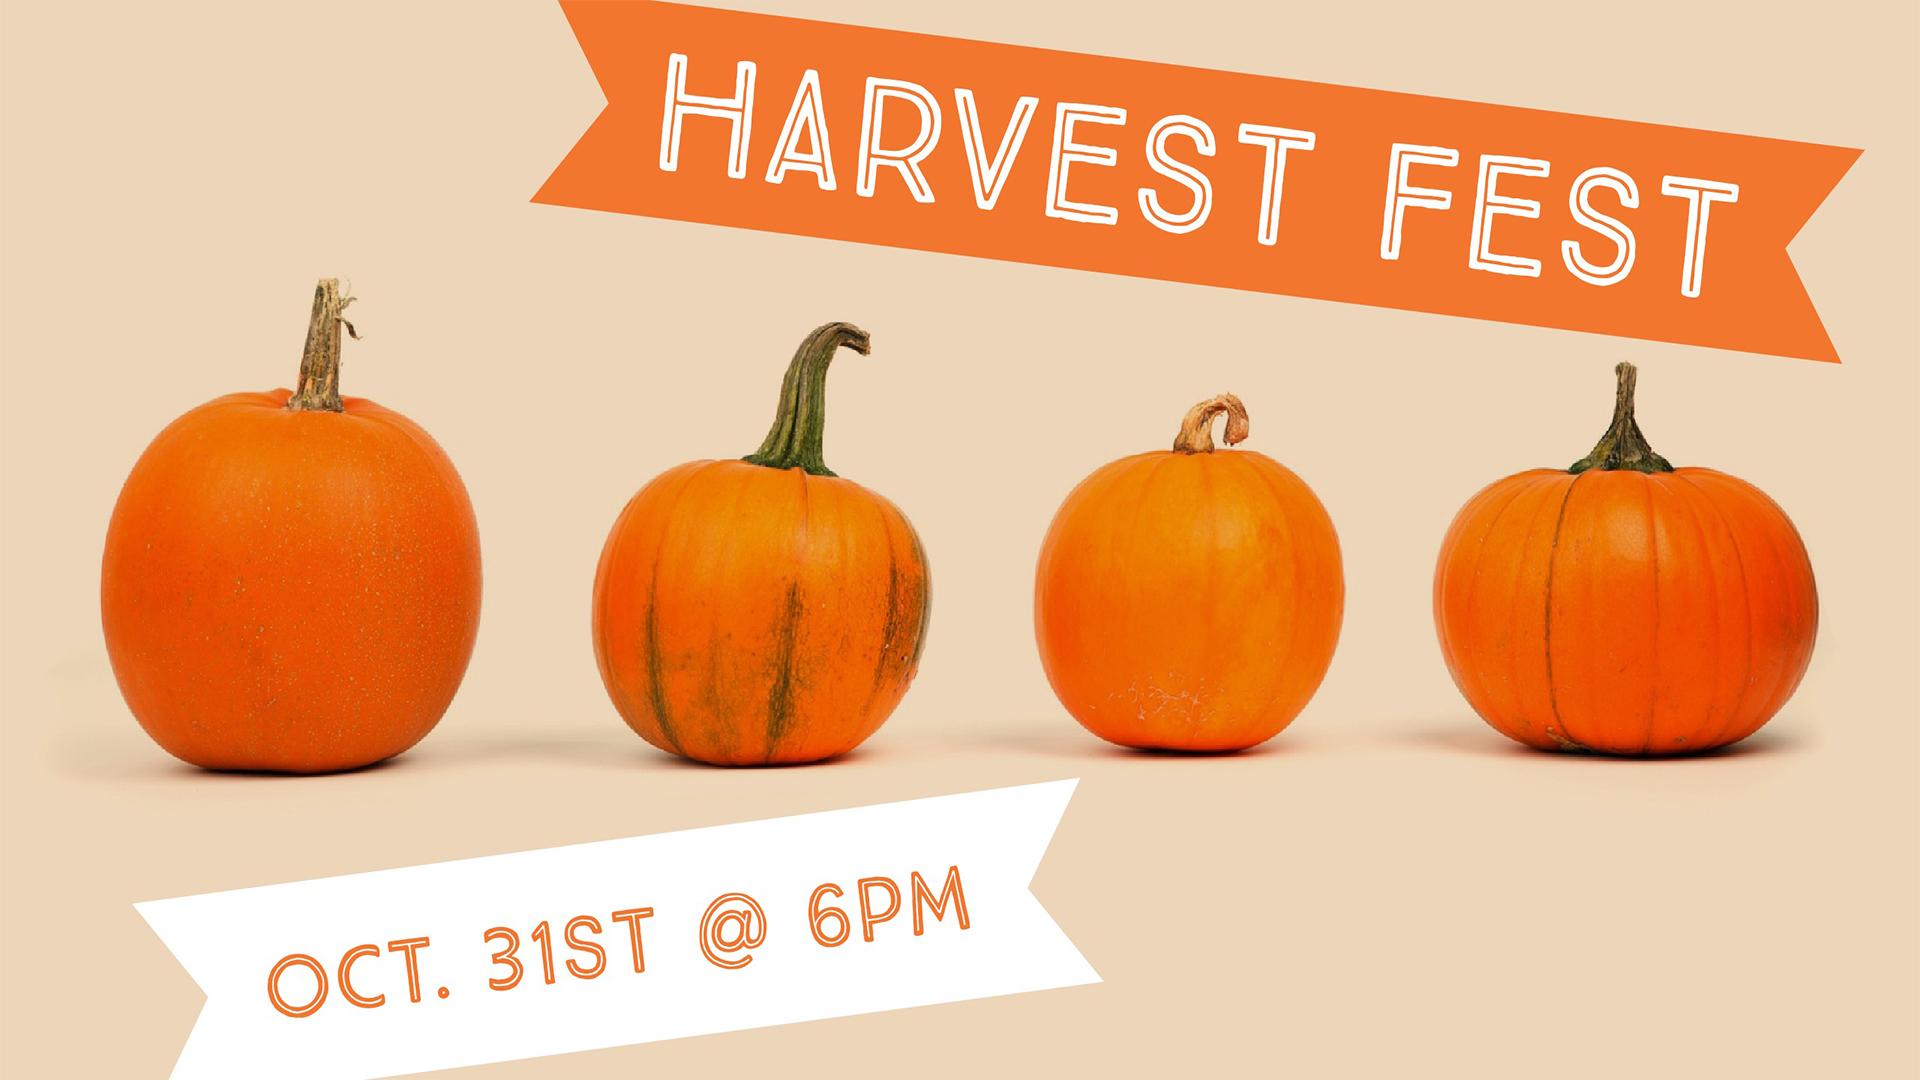 Harvest fest graphic